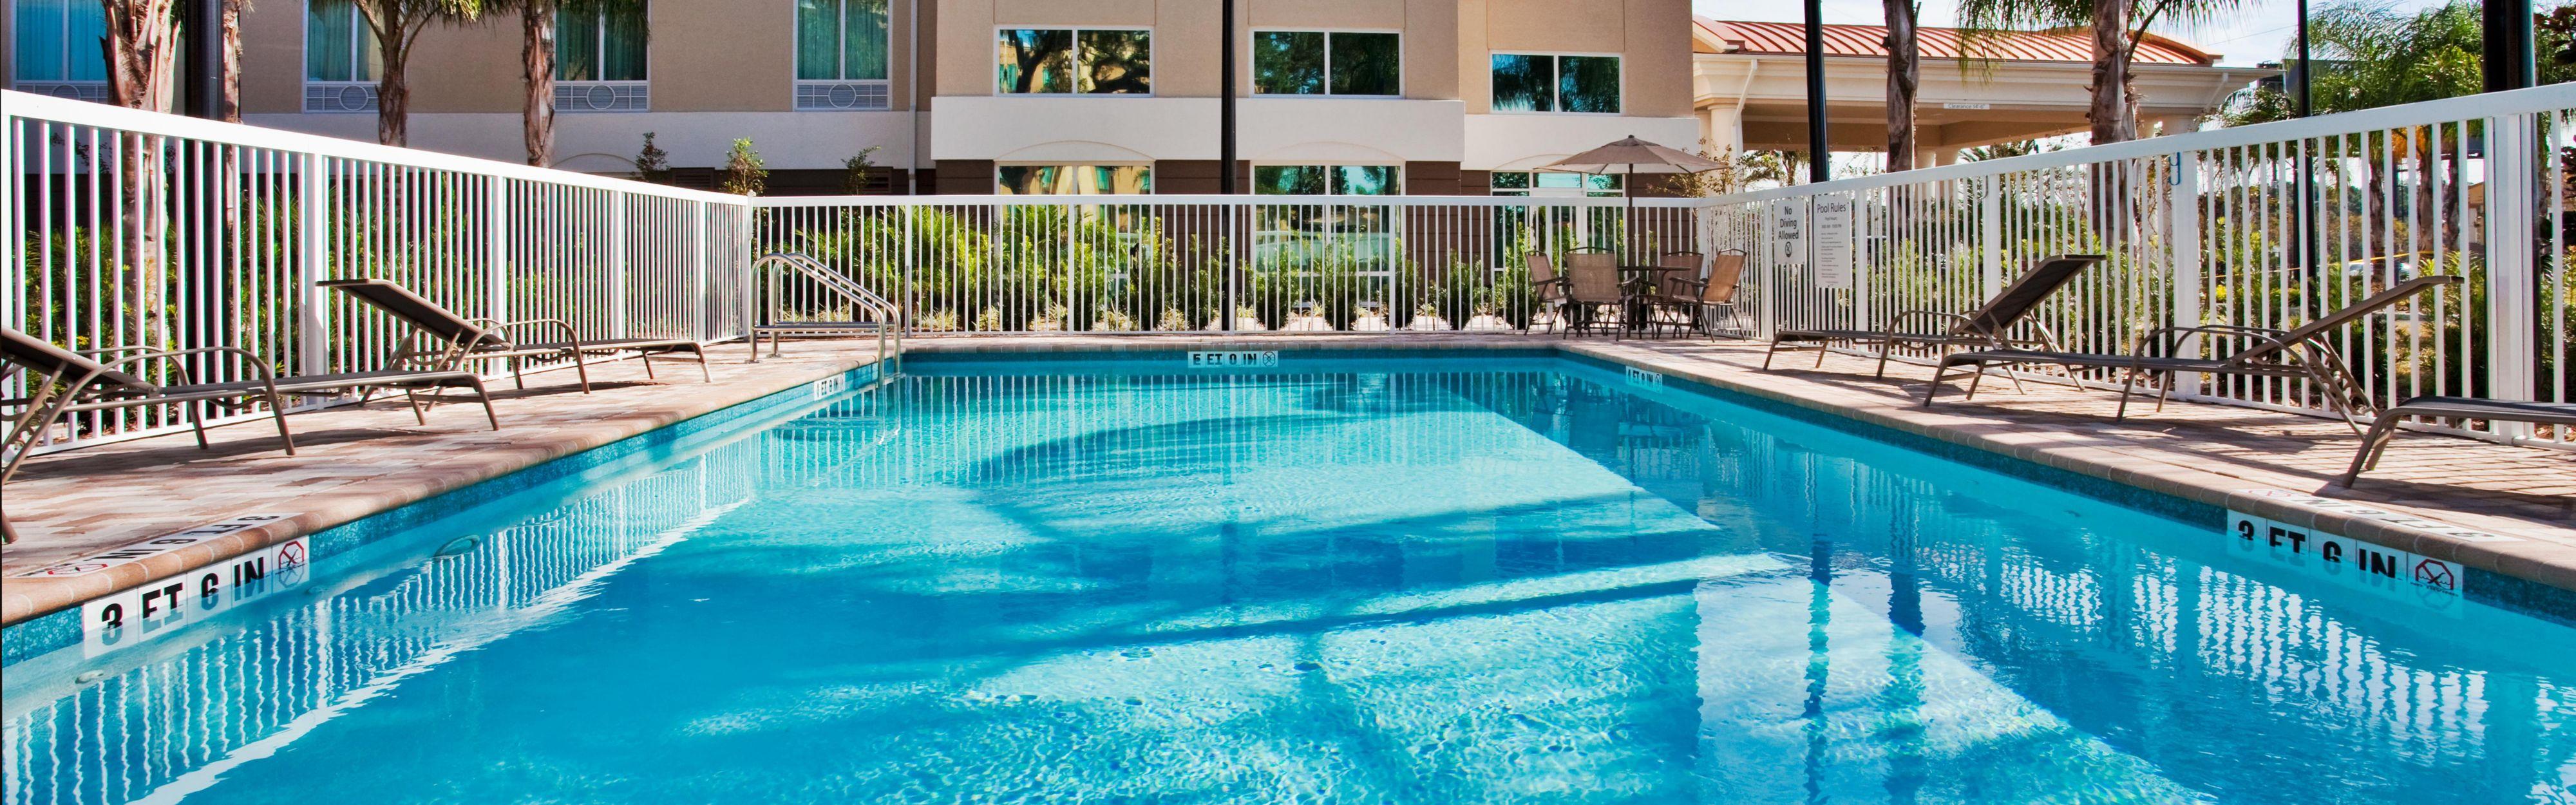 Holiday Inn Express & Suites Orlando - Apopka image 2